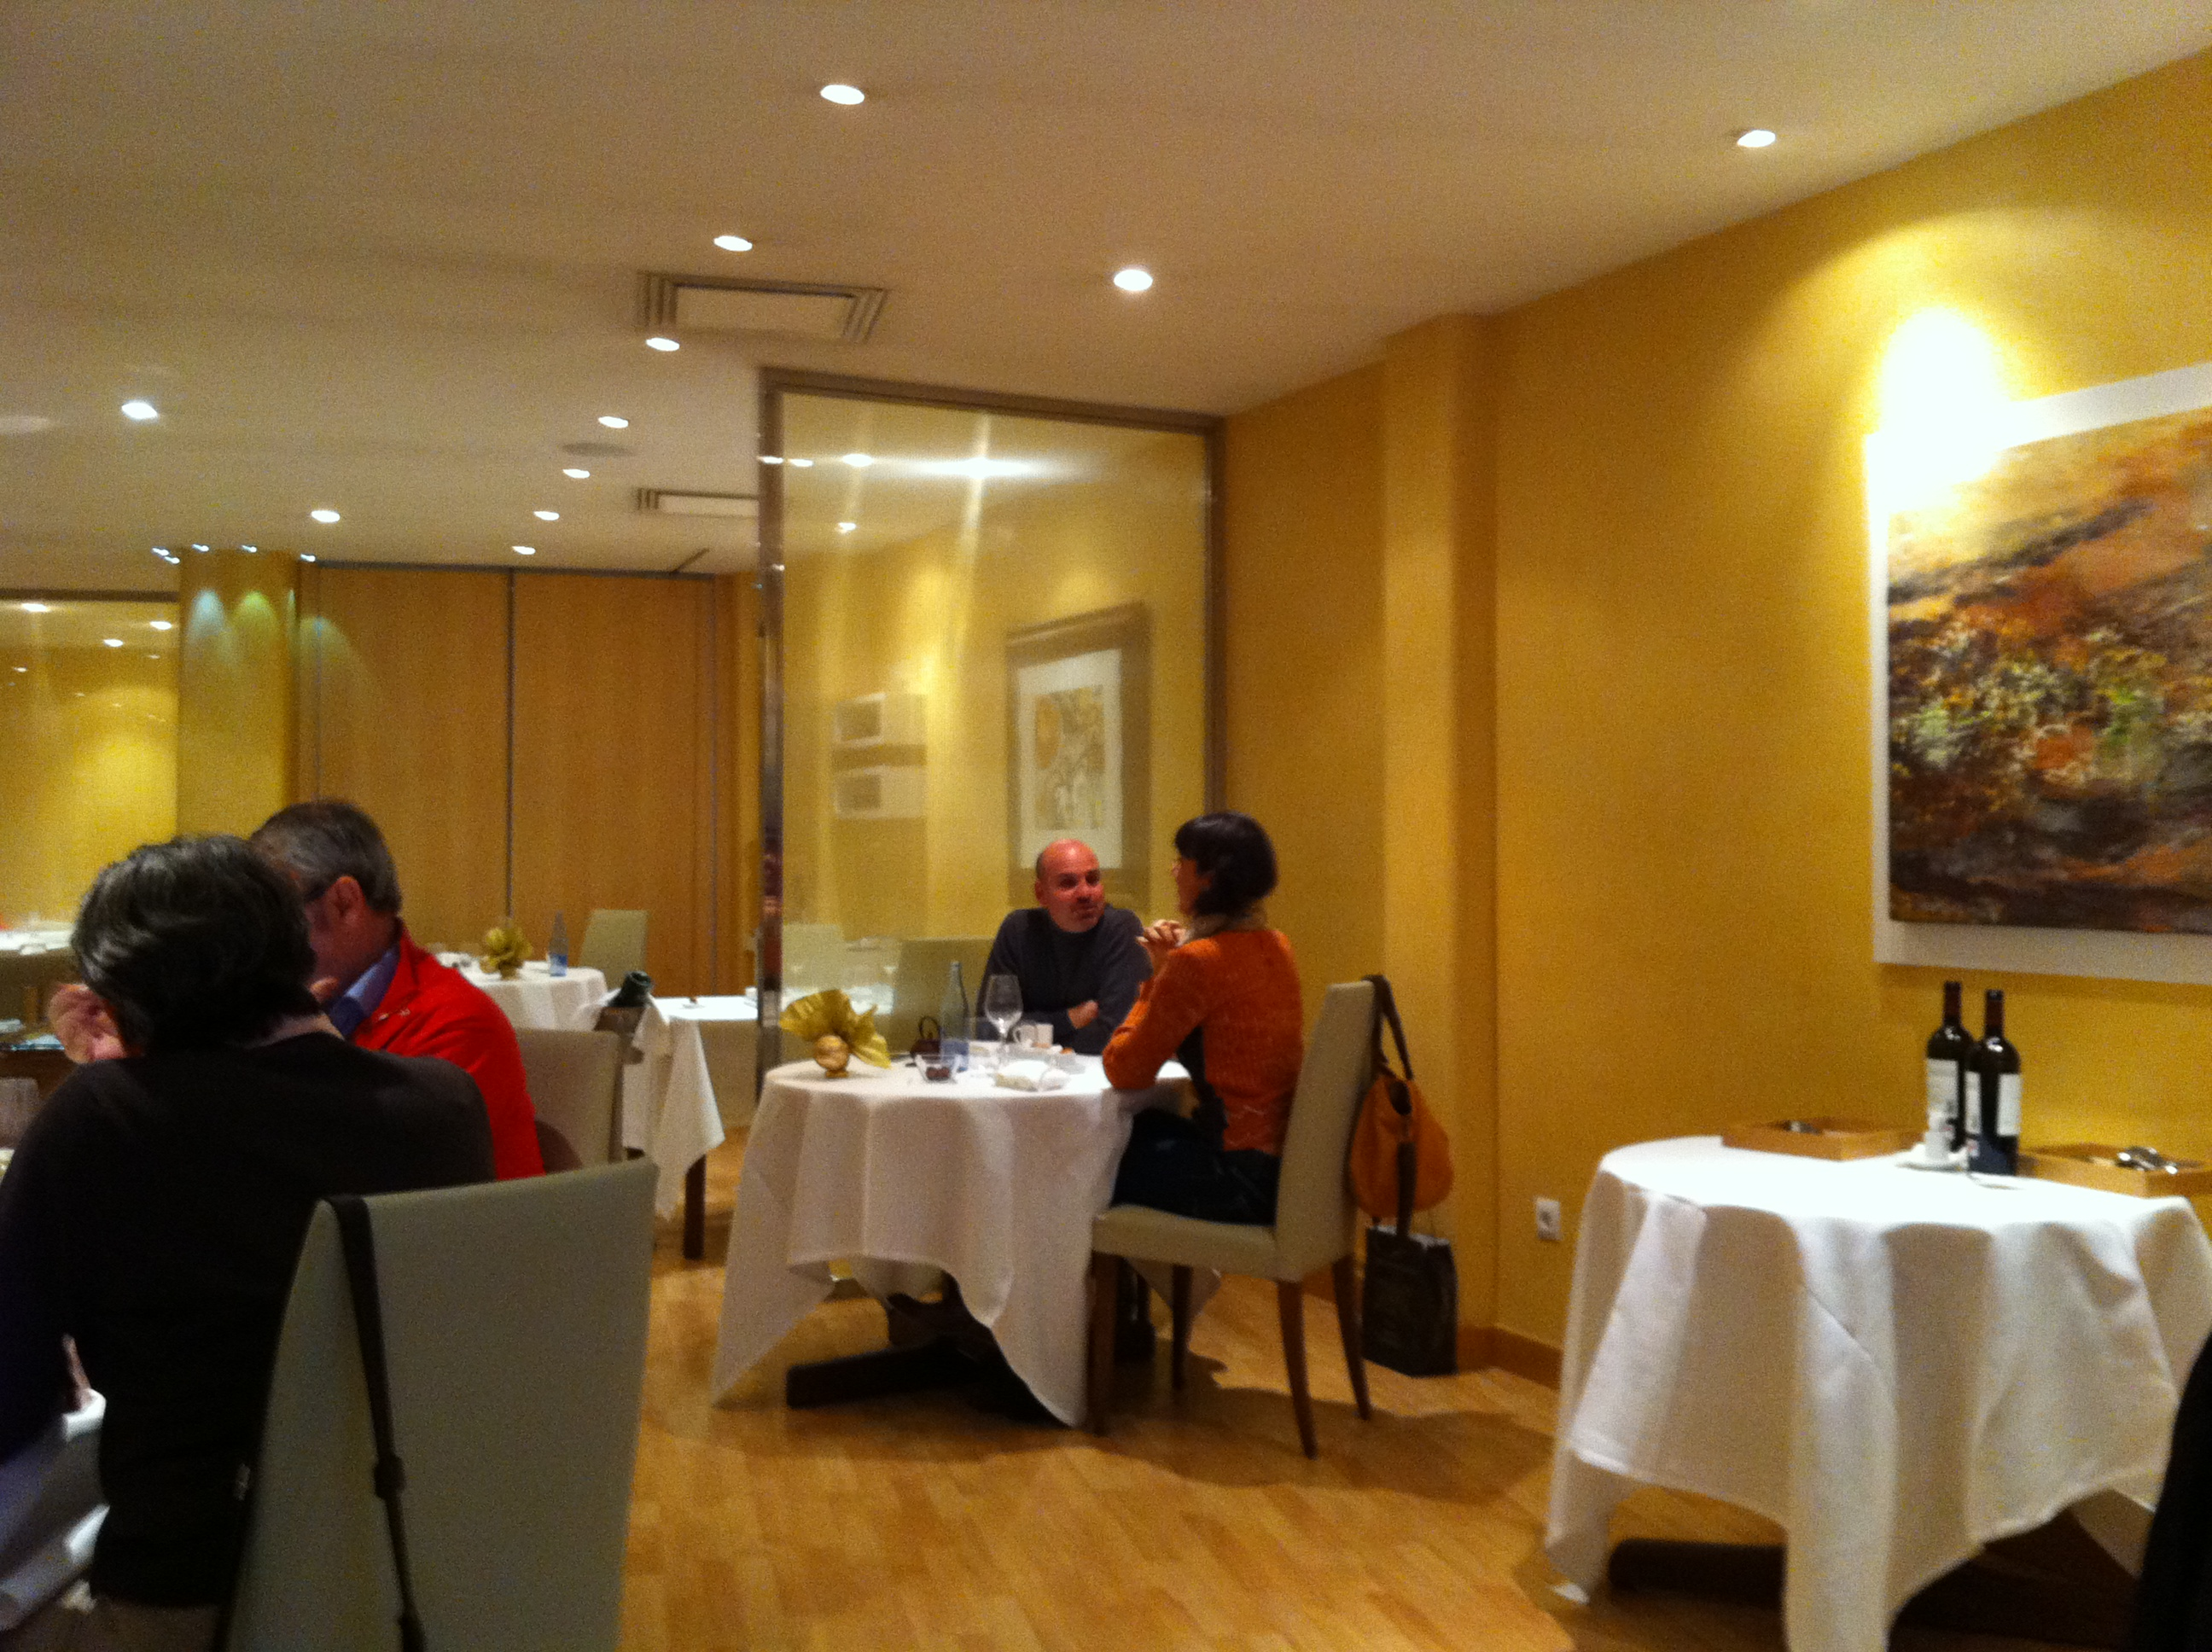 Gastronomia restaurant massana girona voltar i voltar per les arts esc niques - Restaurant massana girona ...